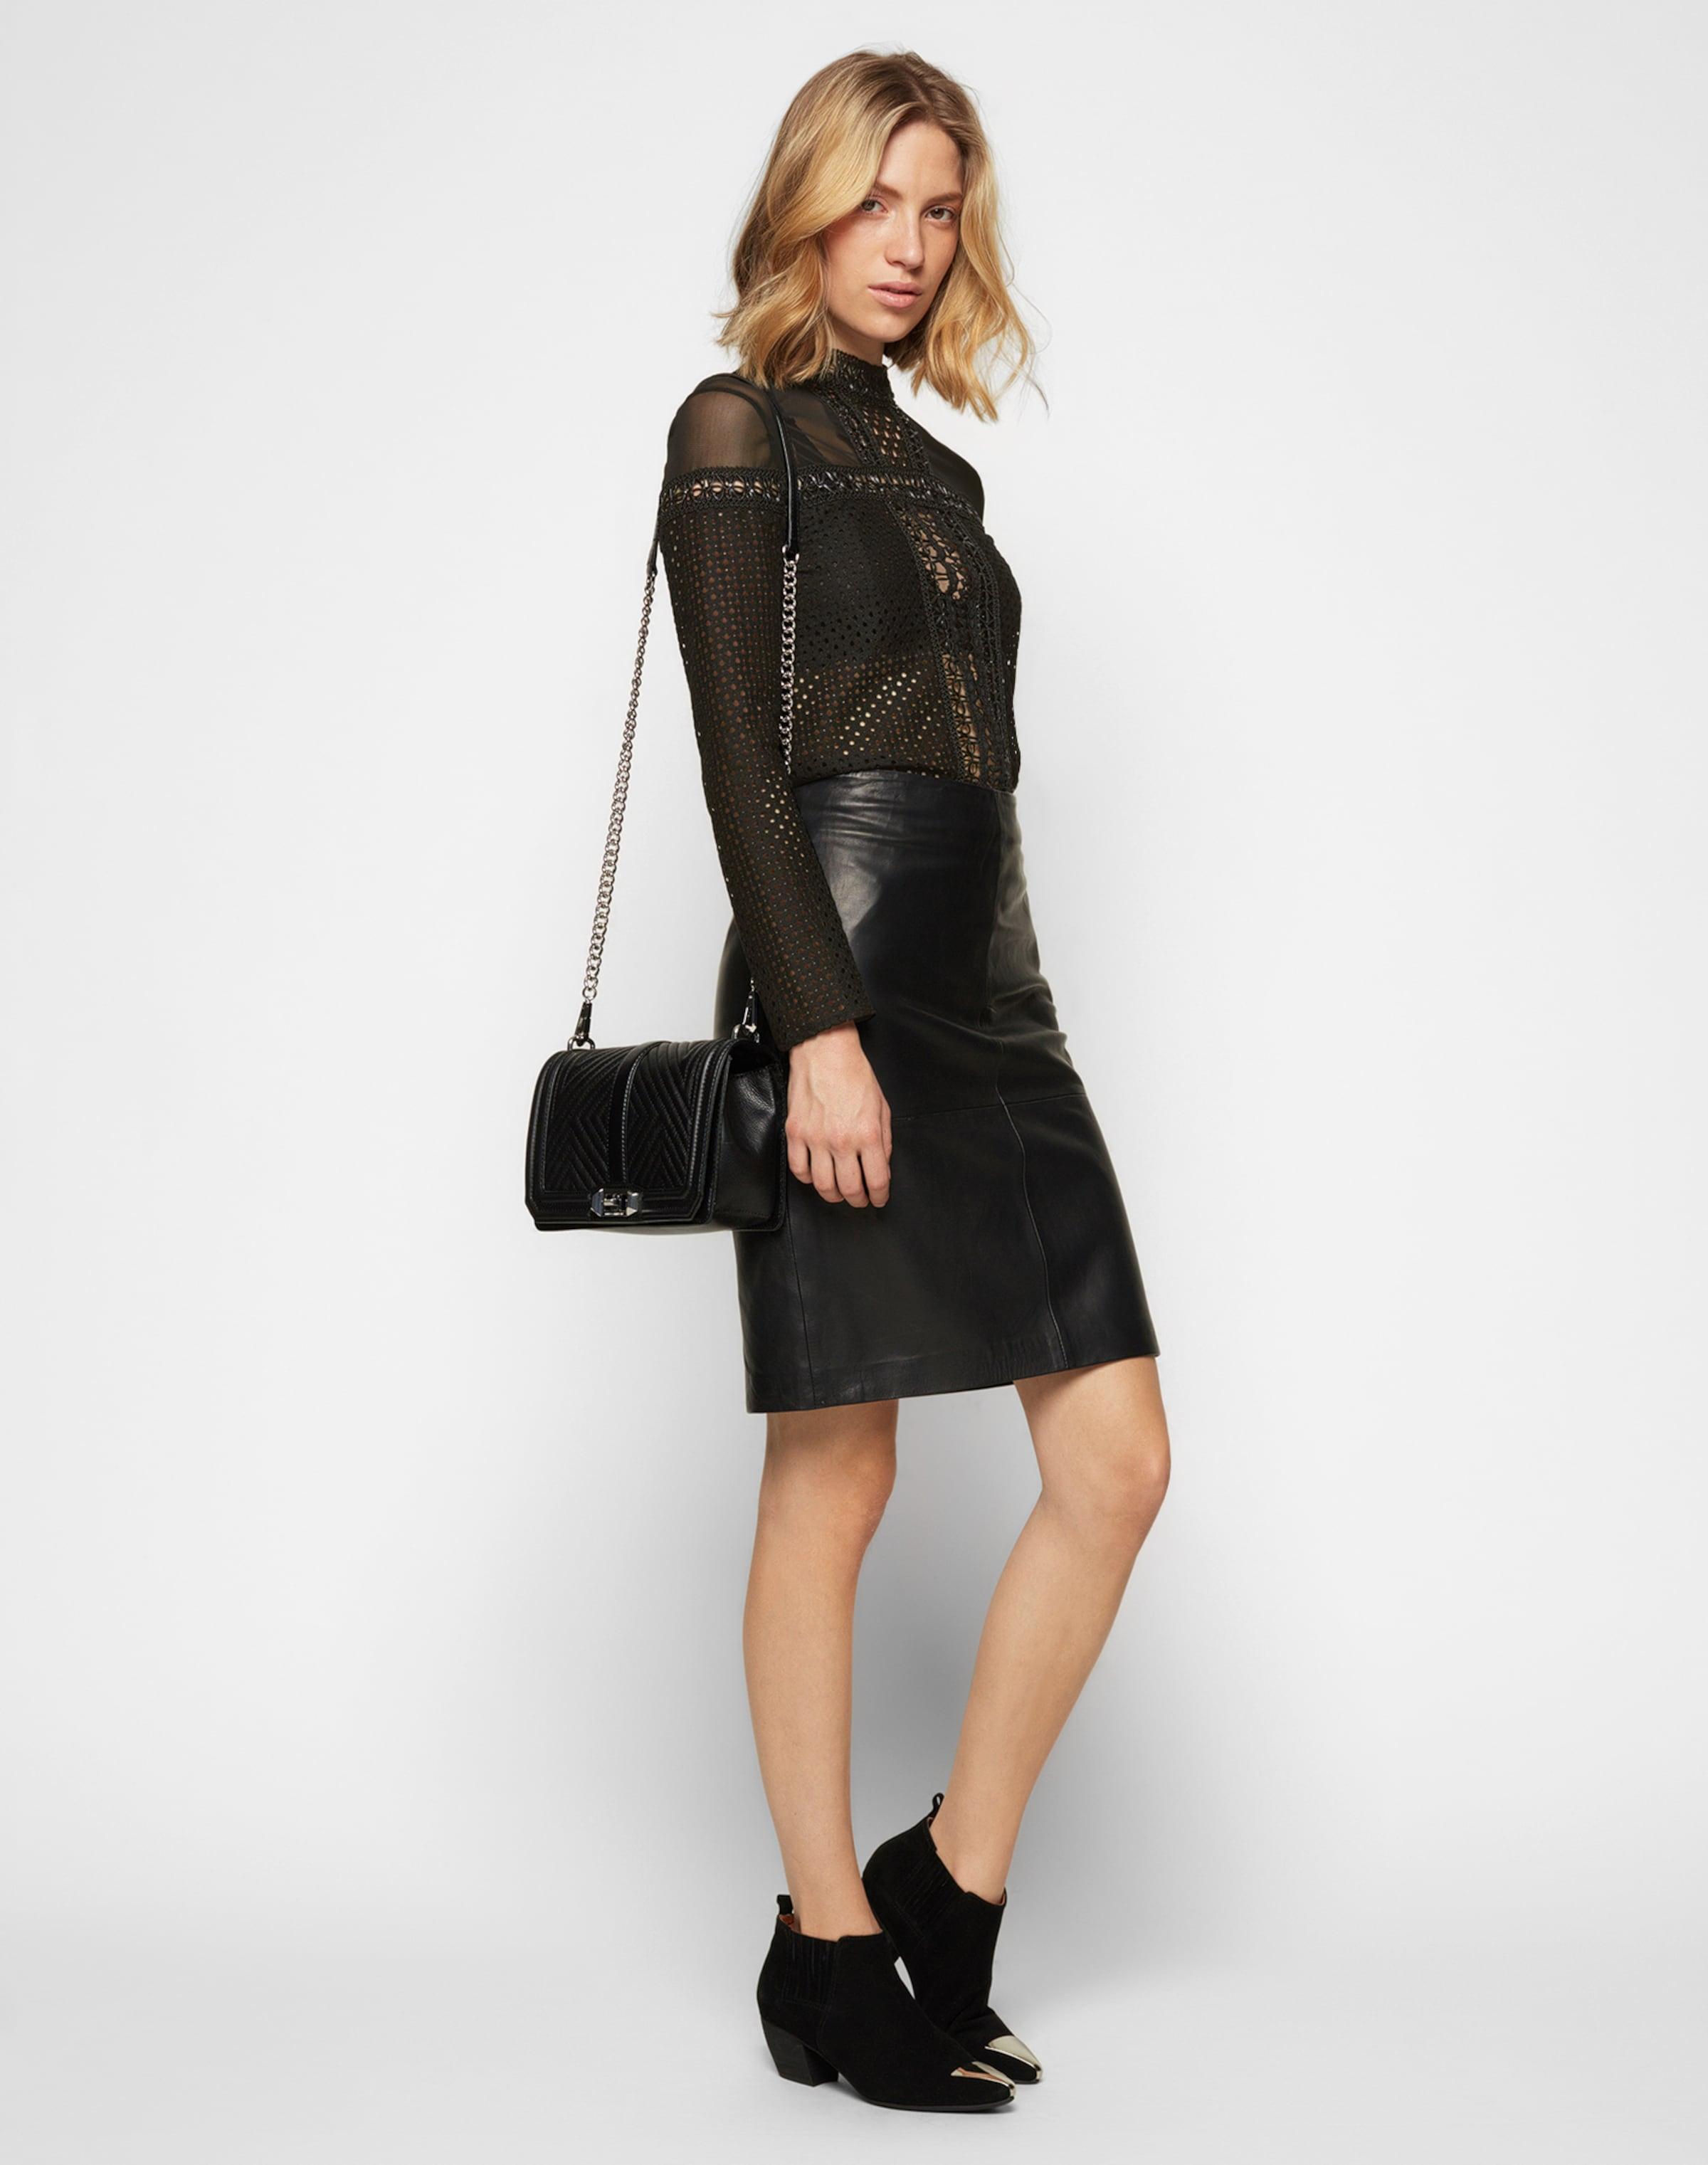 GLAMOROUS Tunika mit Spitze Mode Zum Verkauf MBEni17